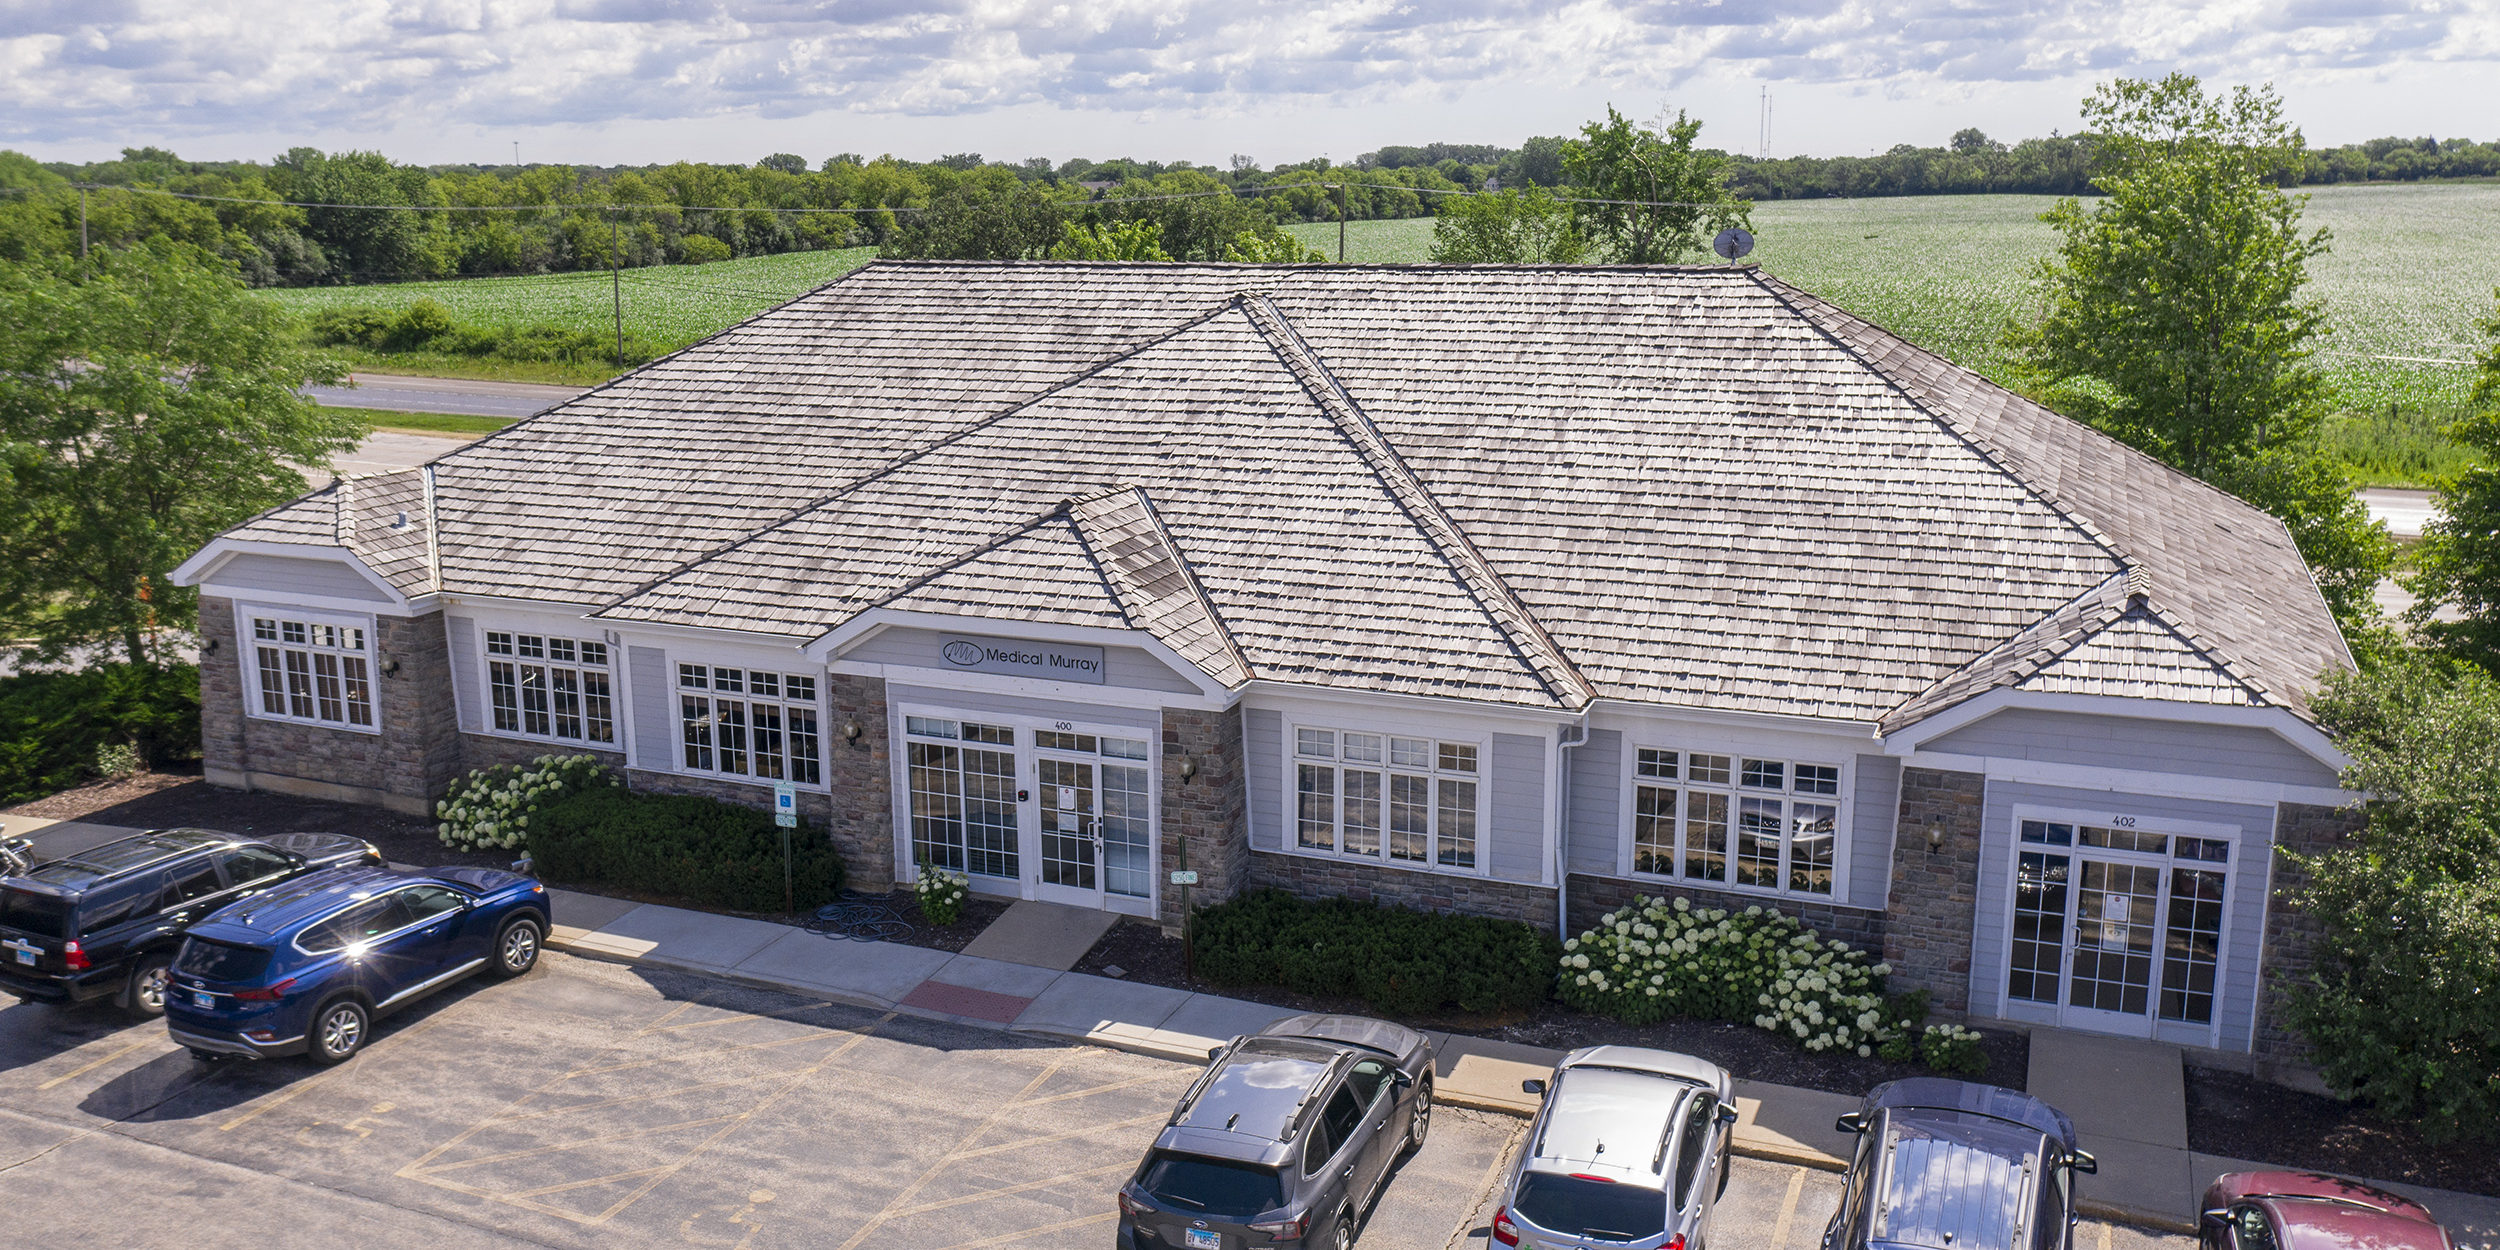 Legend Illinois Facility Drone Photos (20)